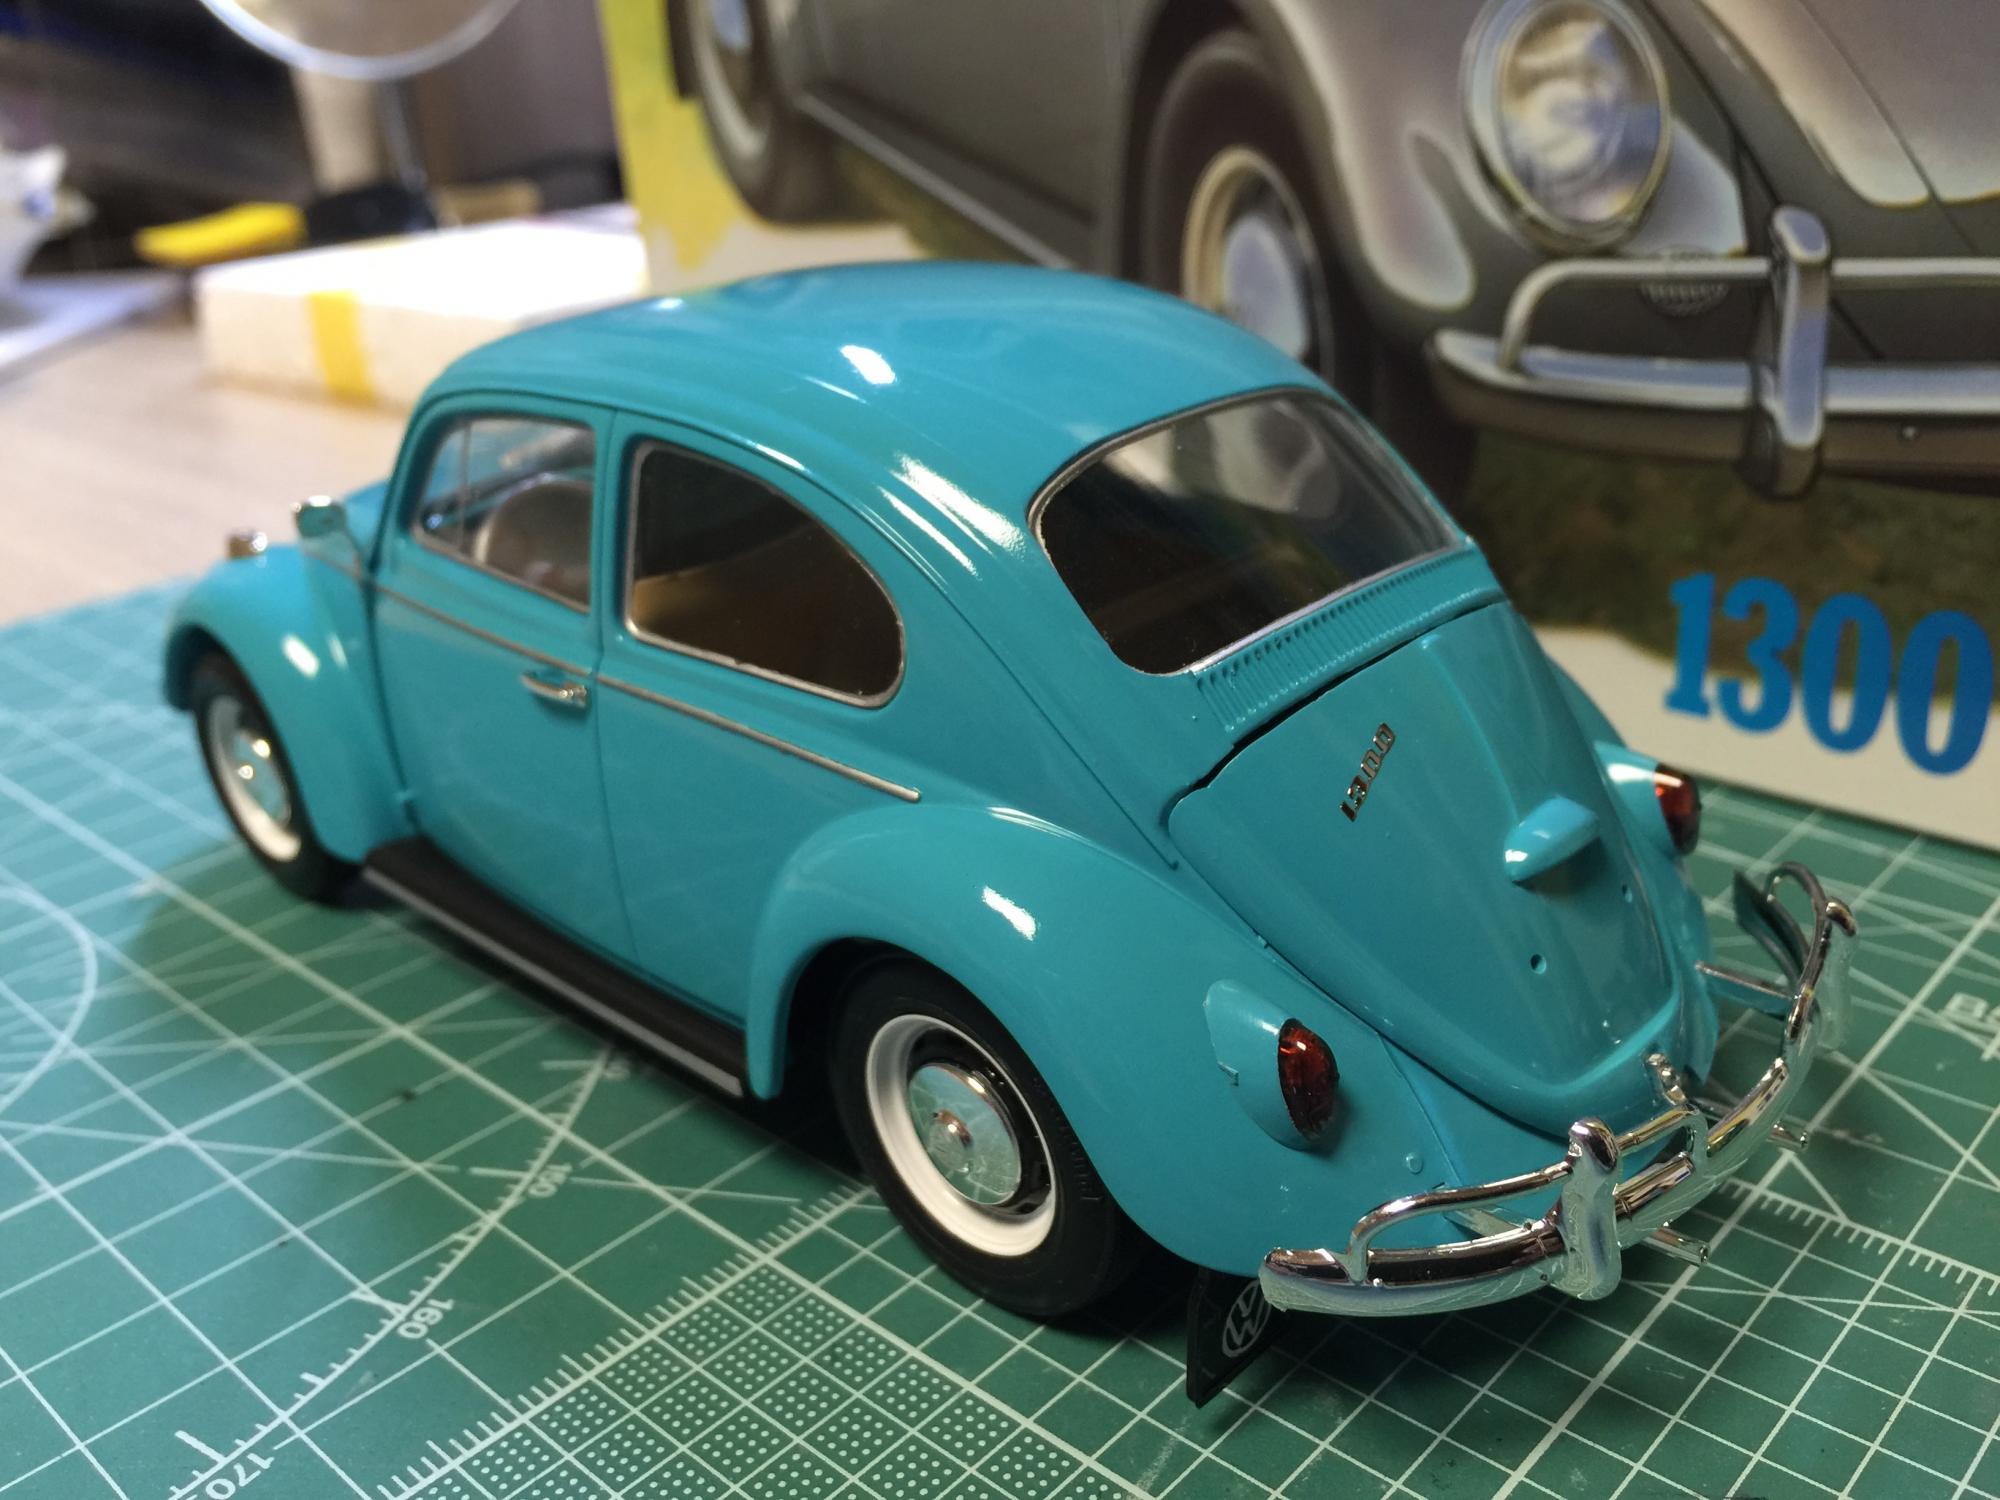 Tamiya 1966 VW 1300 Beetle - Under Glass - Model Cars Magazine Forum